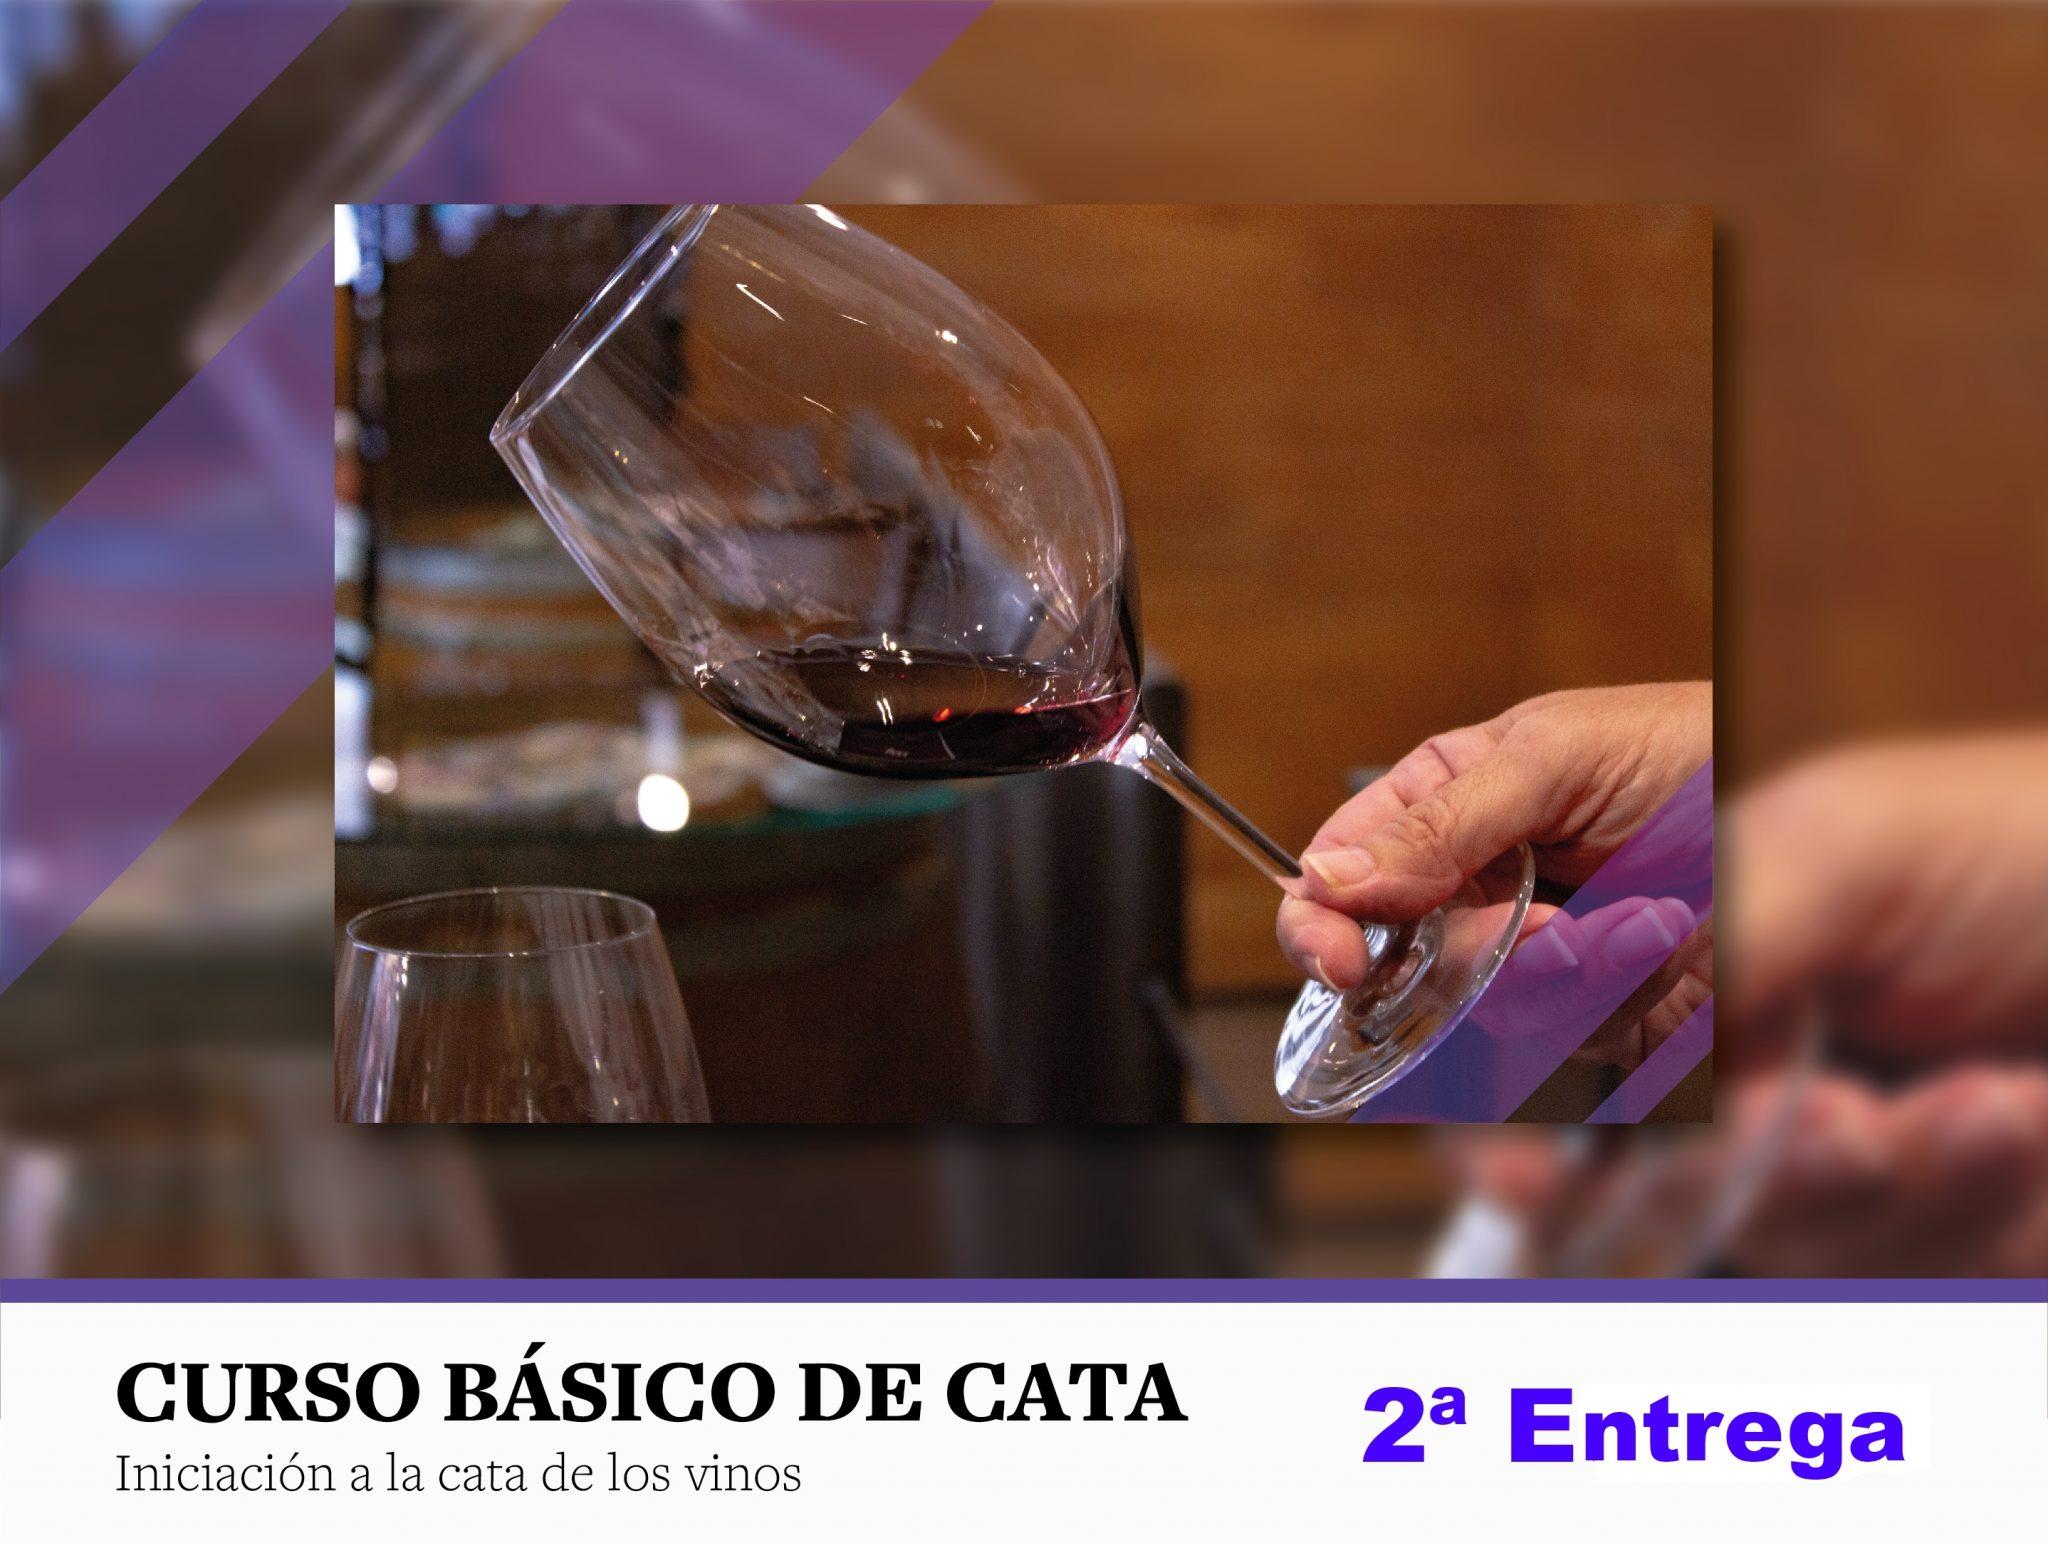 ¿Cómo se elabora un vino tinto? Segunda entrega